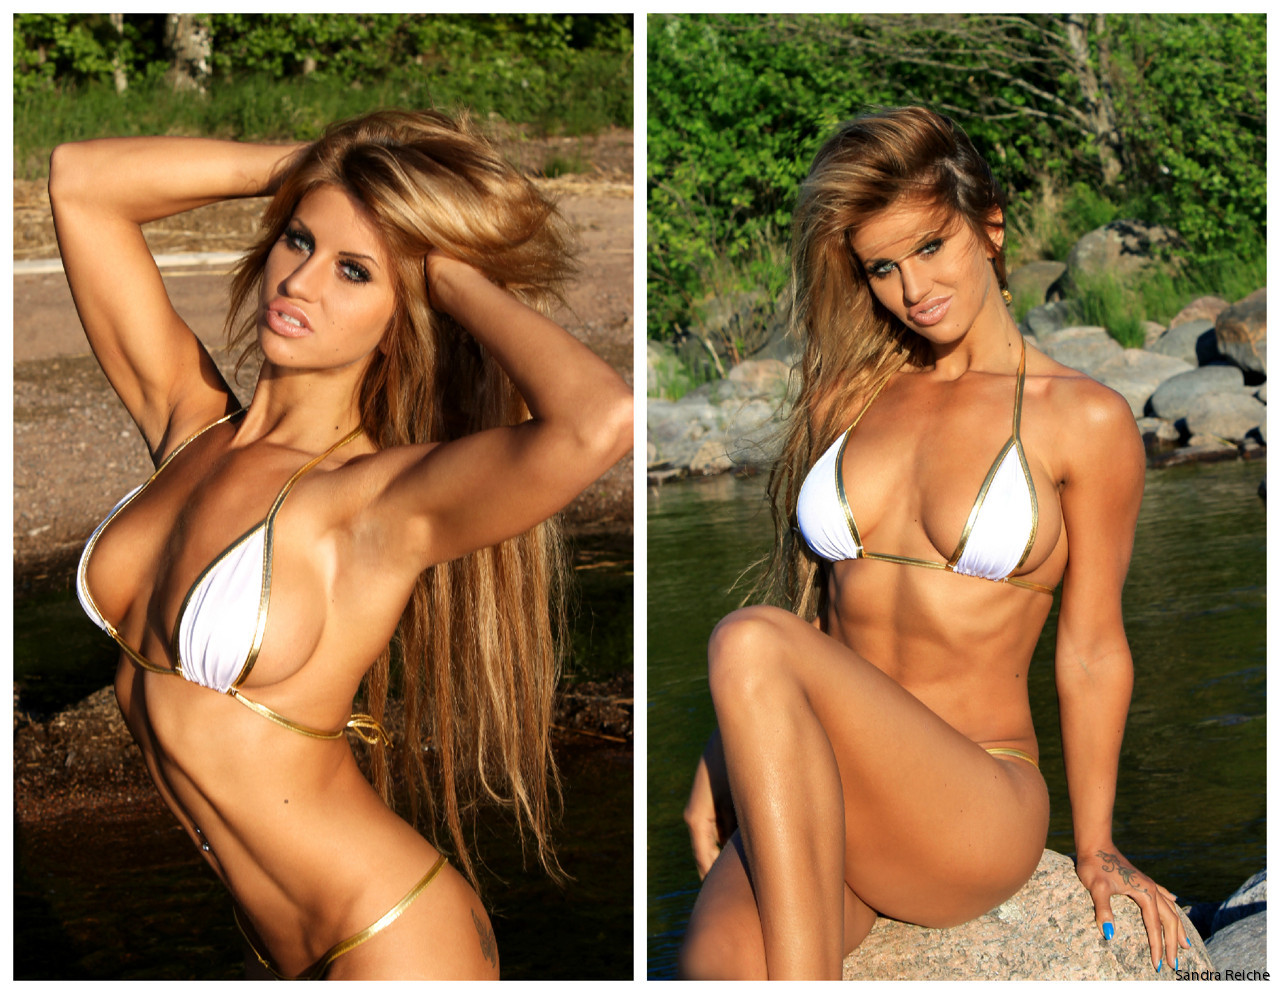 sexiga bikini er på svenska